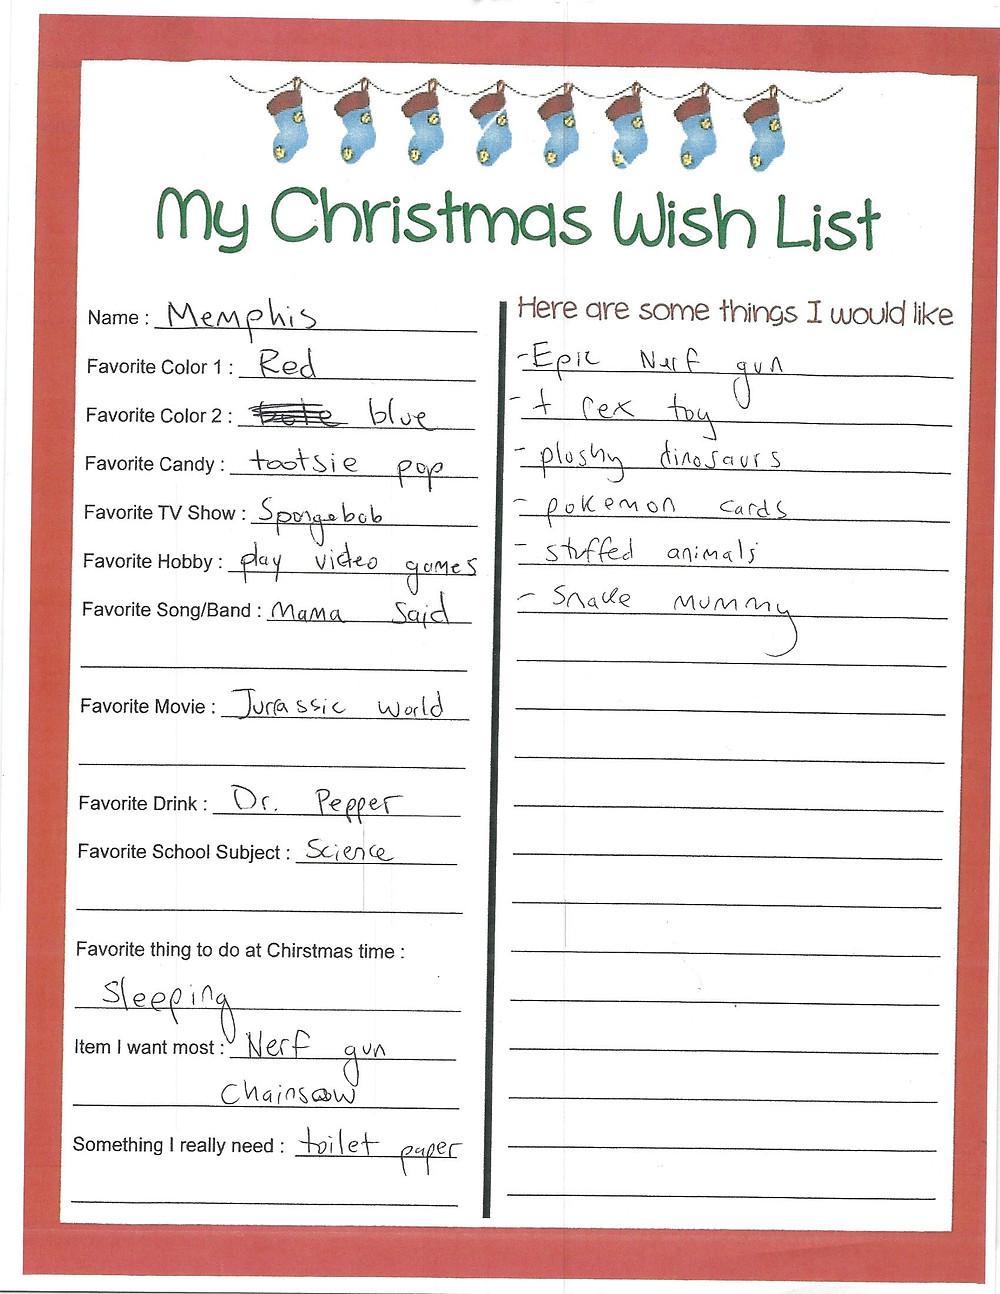 Memphis' Christmas Wish List